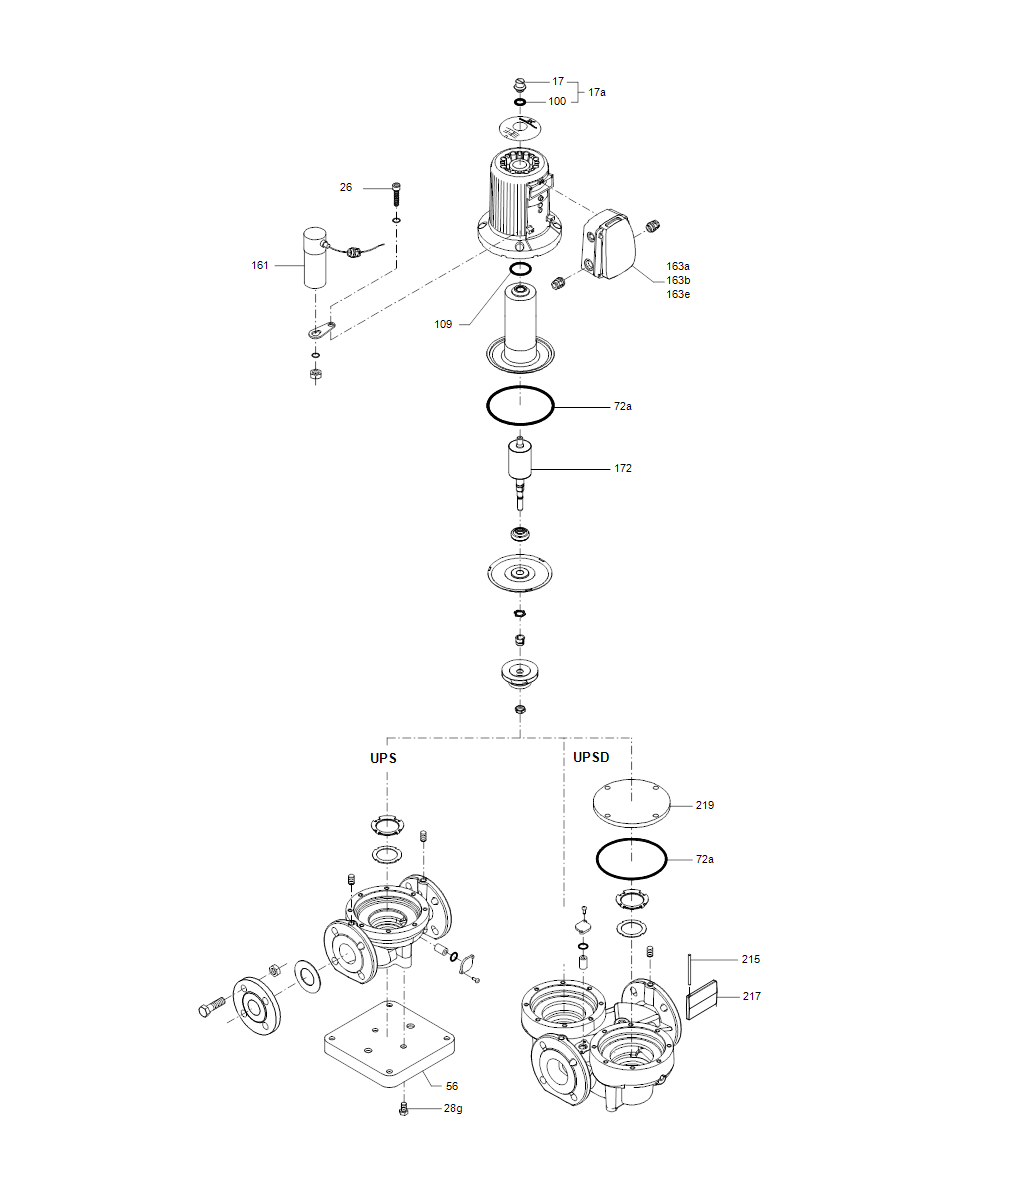 UPS деталировка